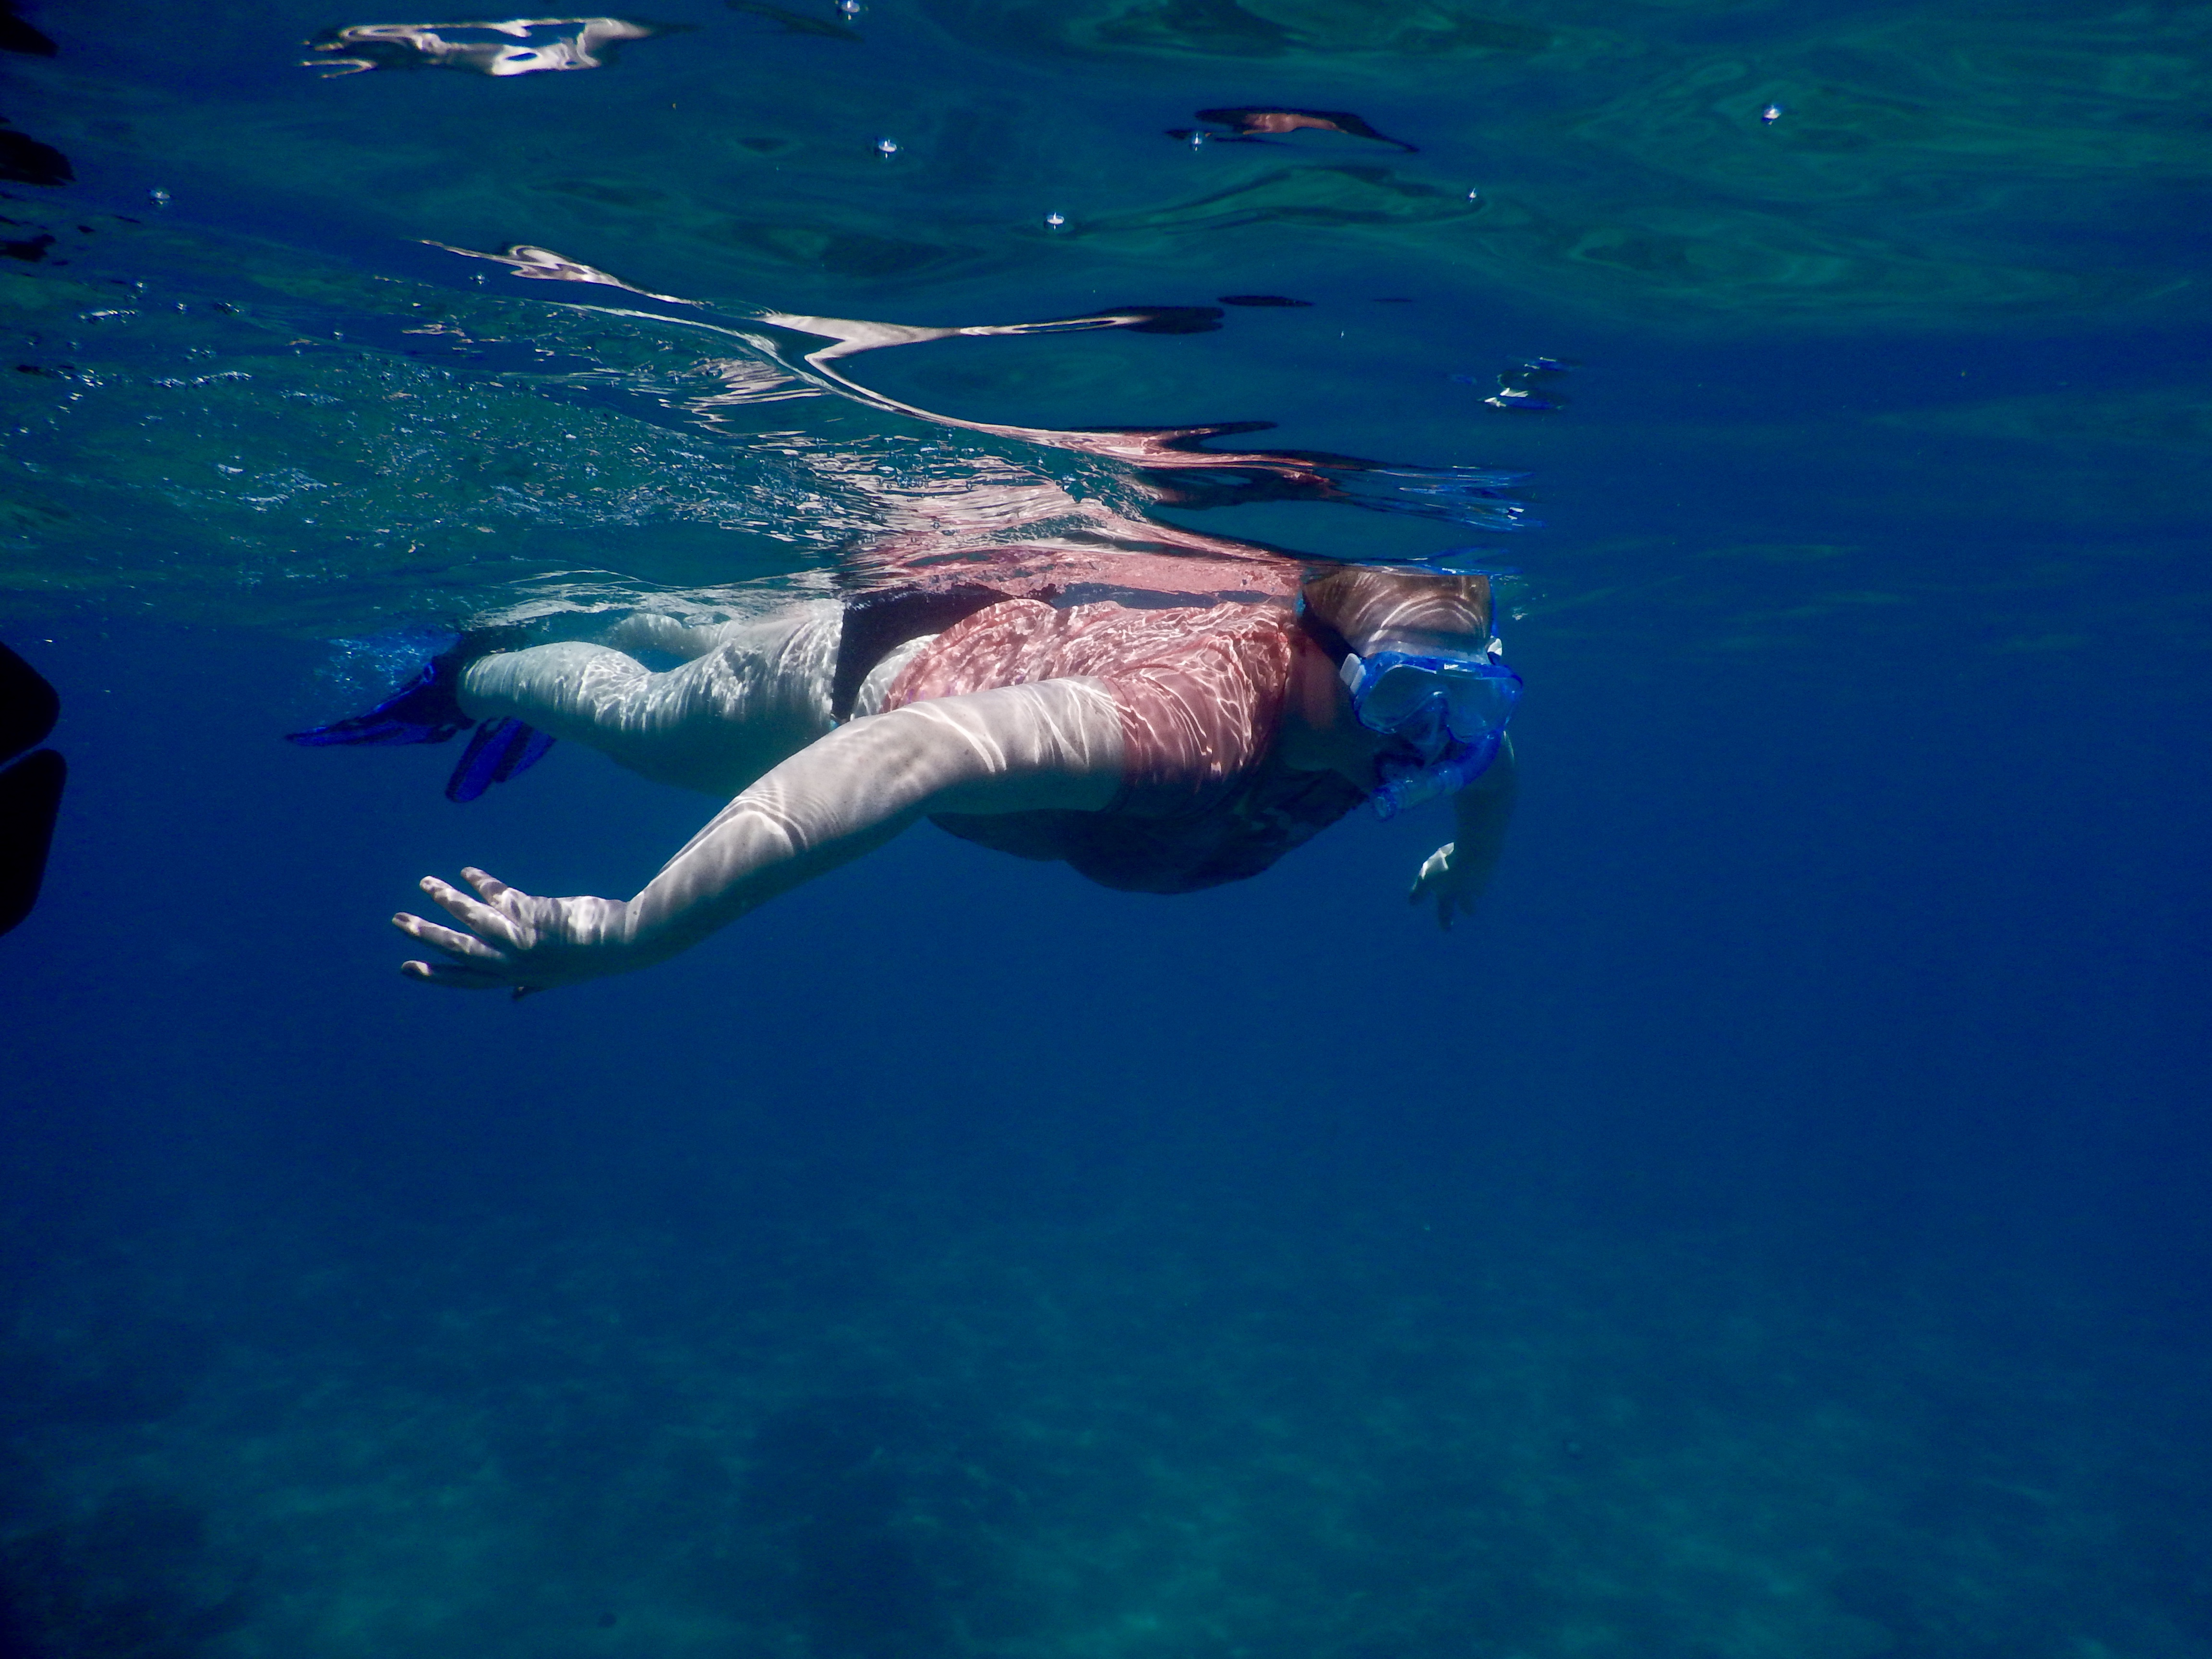 Water Sports Galore! In Maui, Lanai, And Molokini